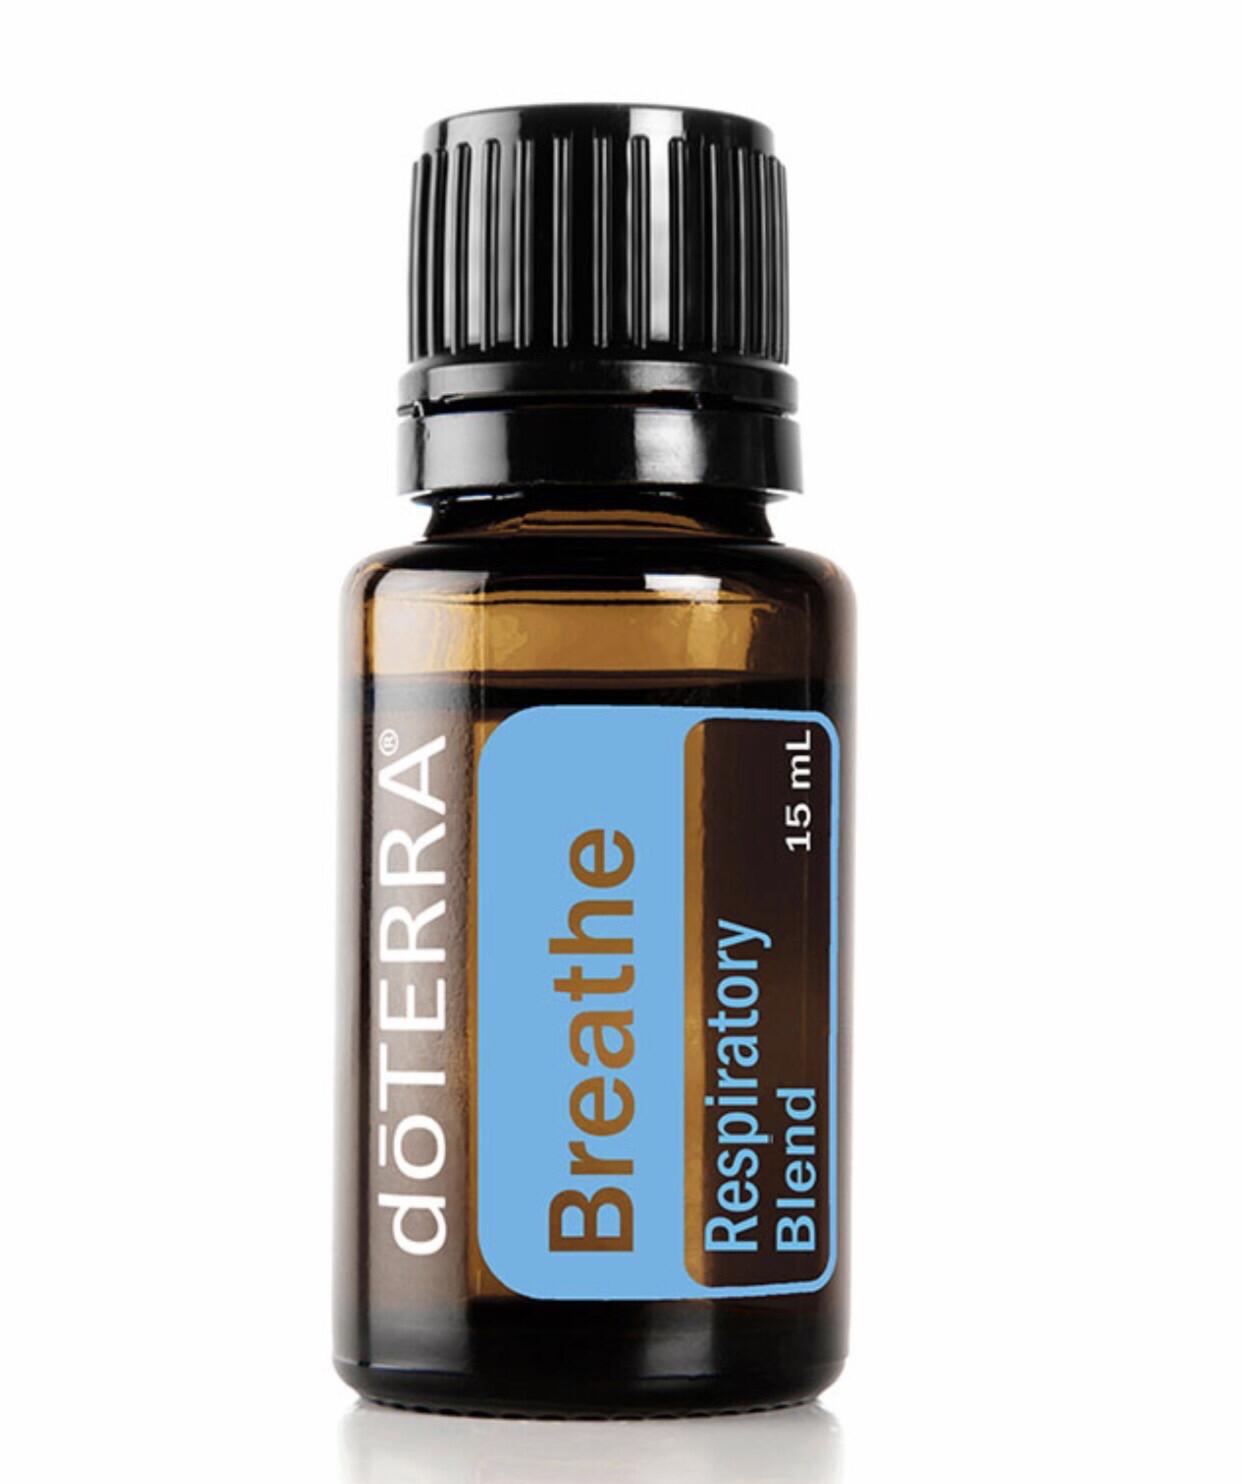 Breathe Doterra